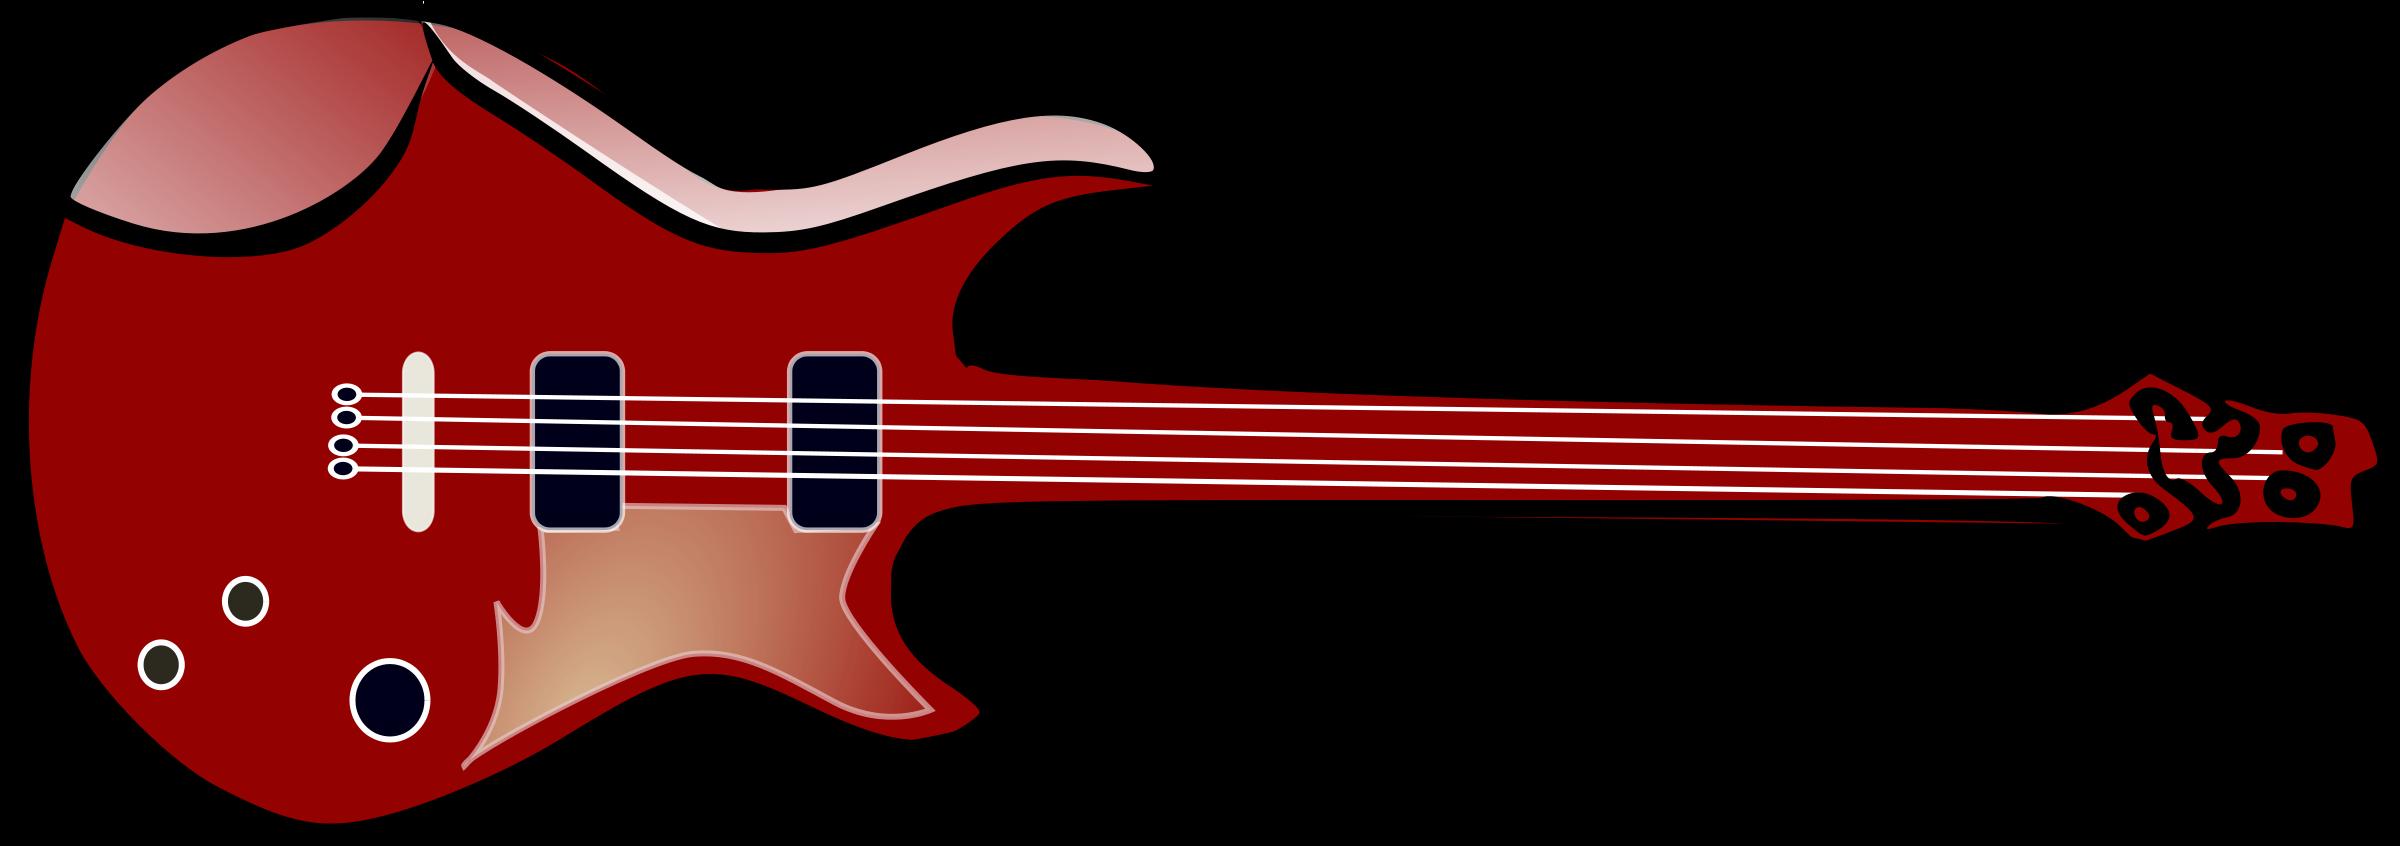 2400x846 Electric guitar clip art free clipart images 2